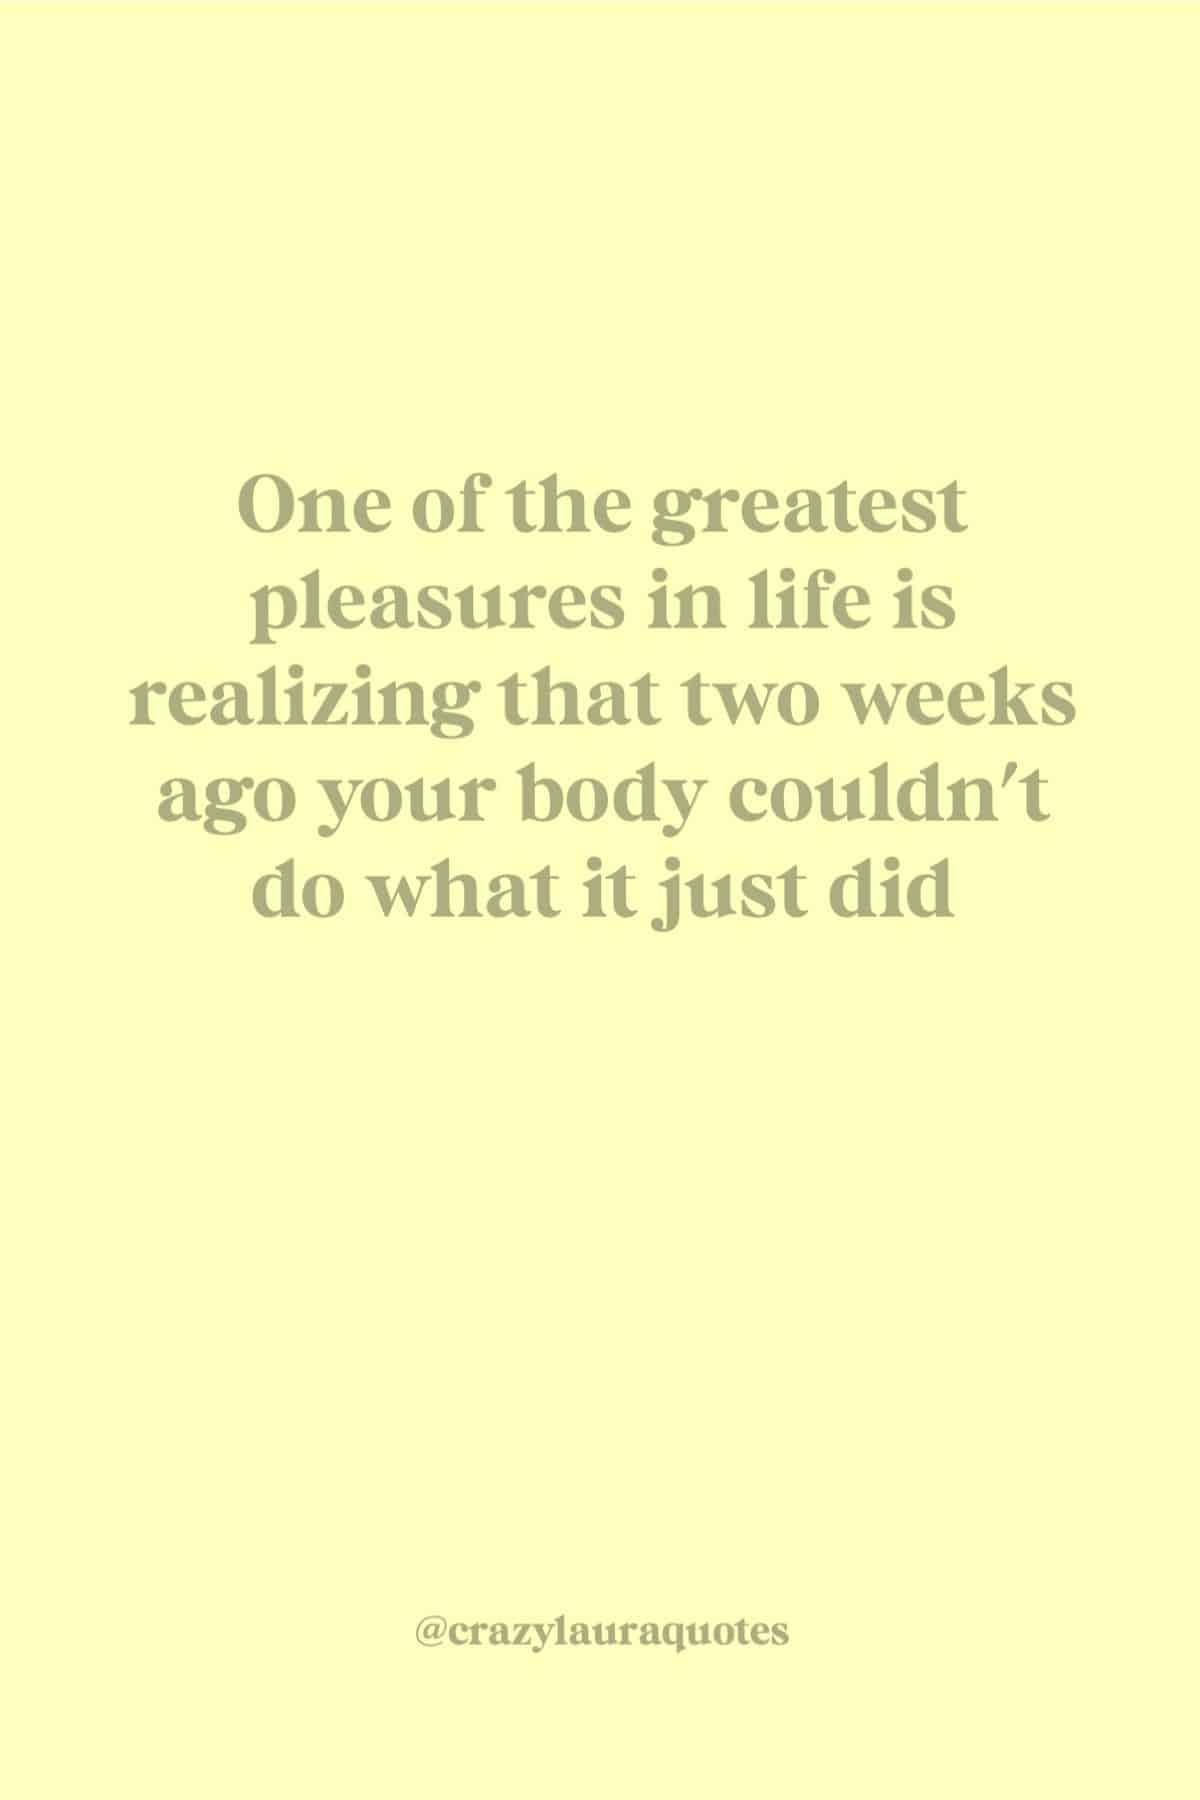 fitness progress quote to motivate